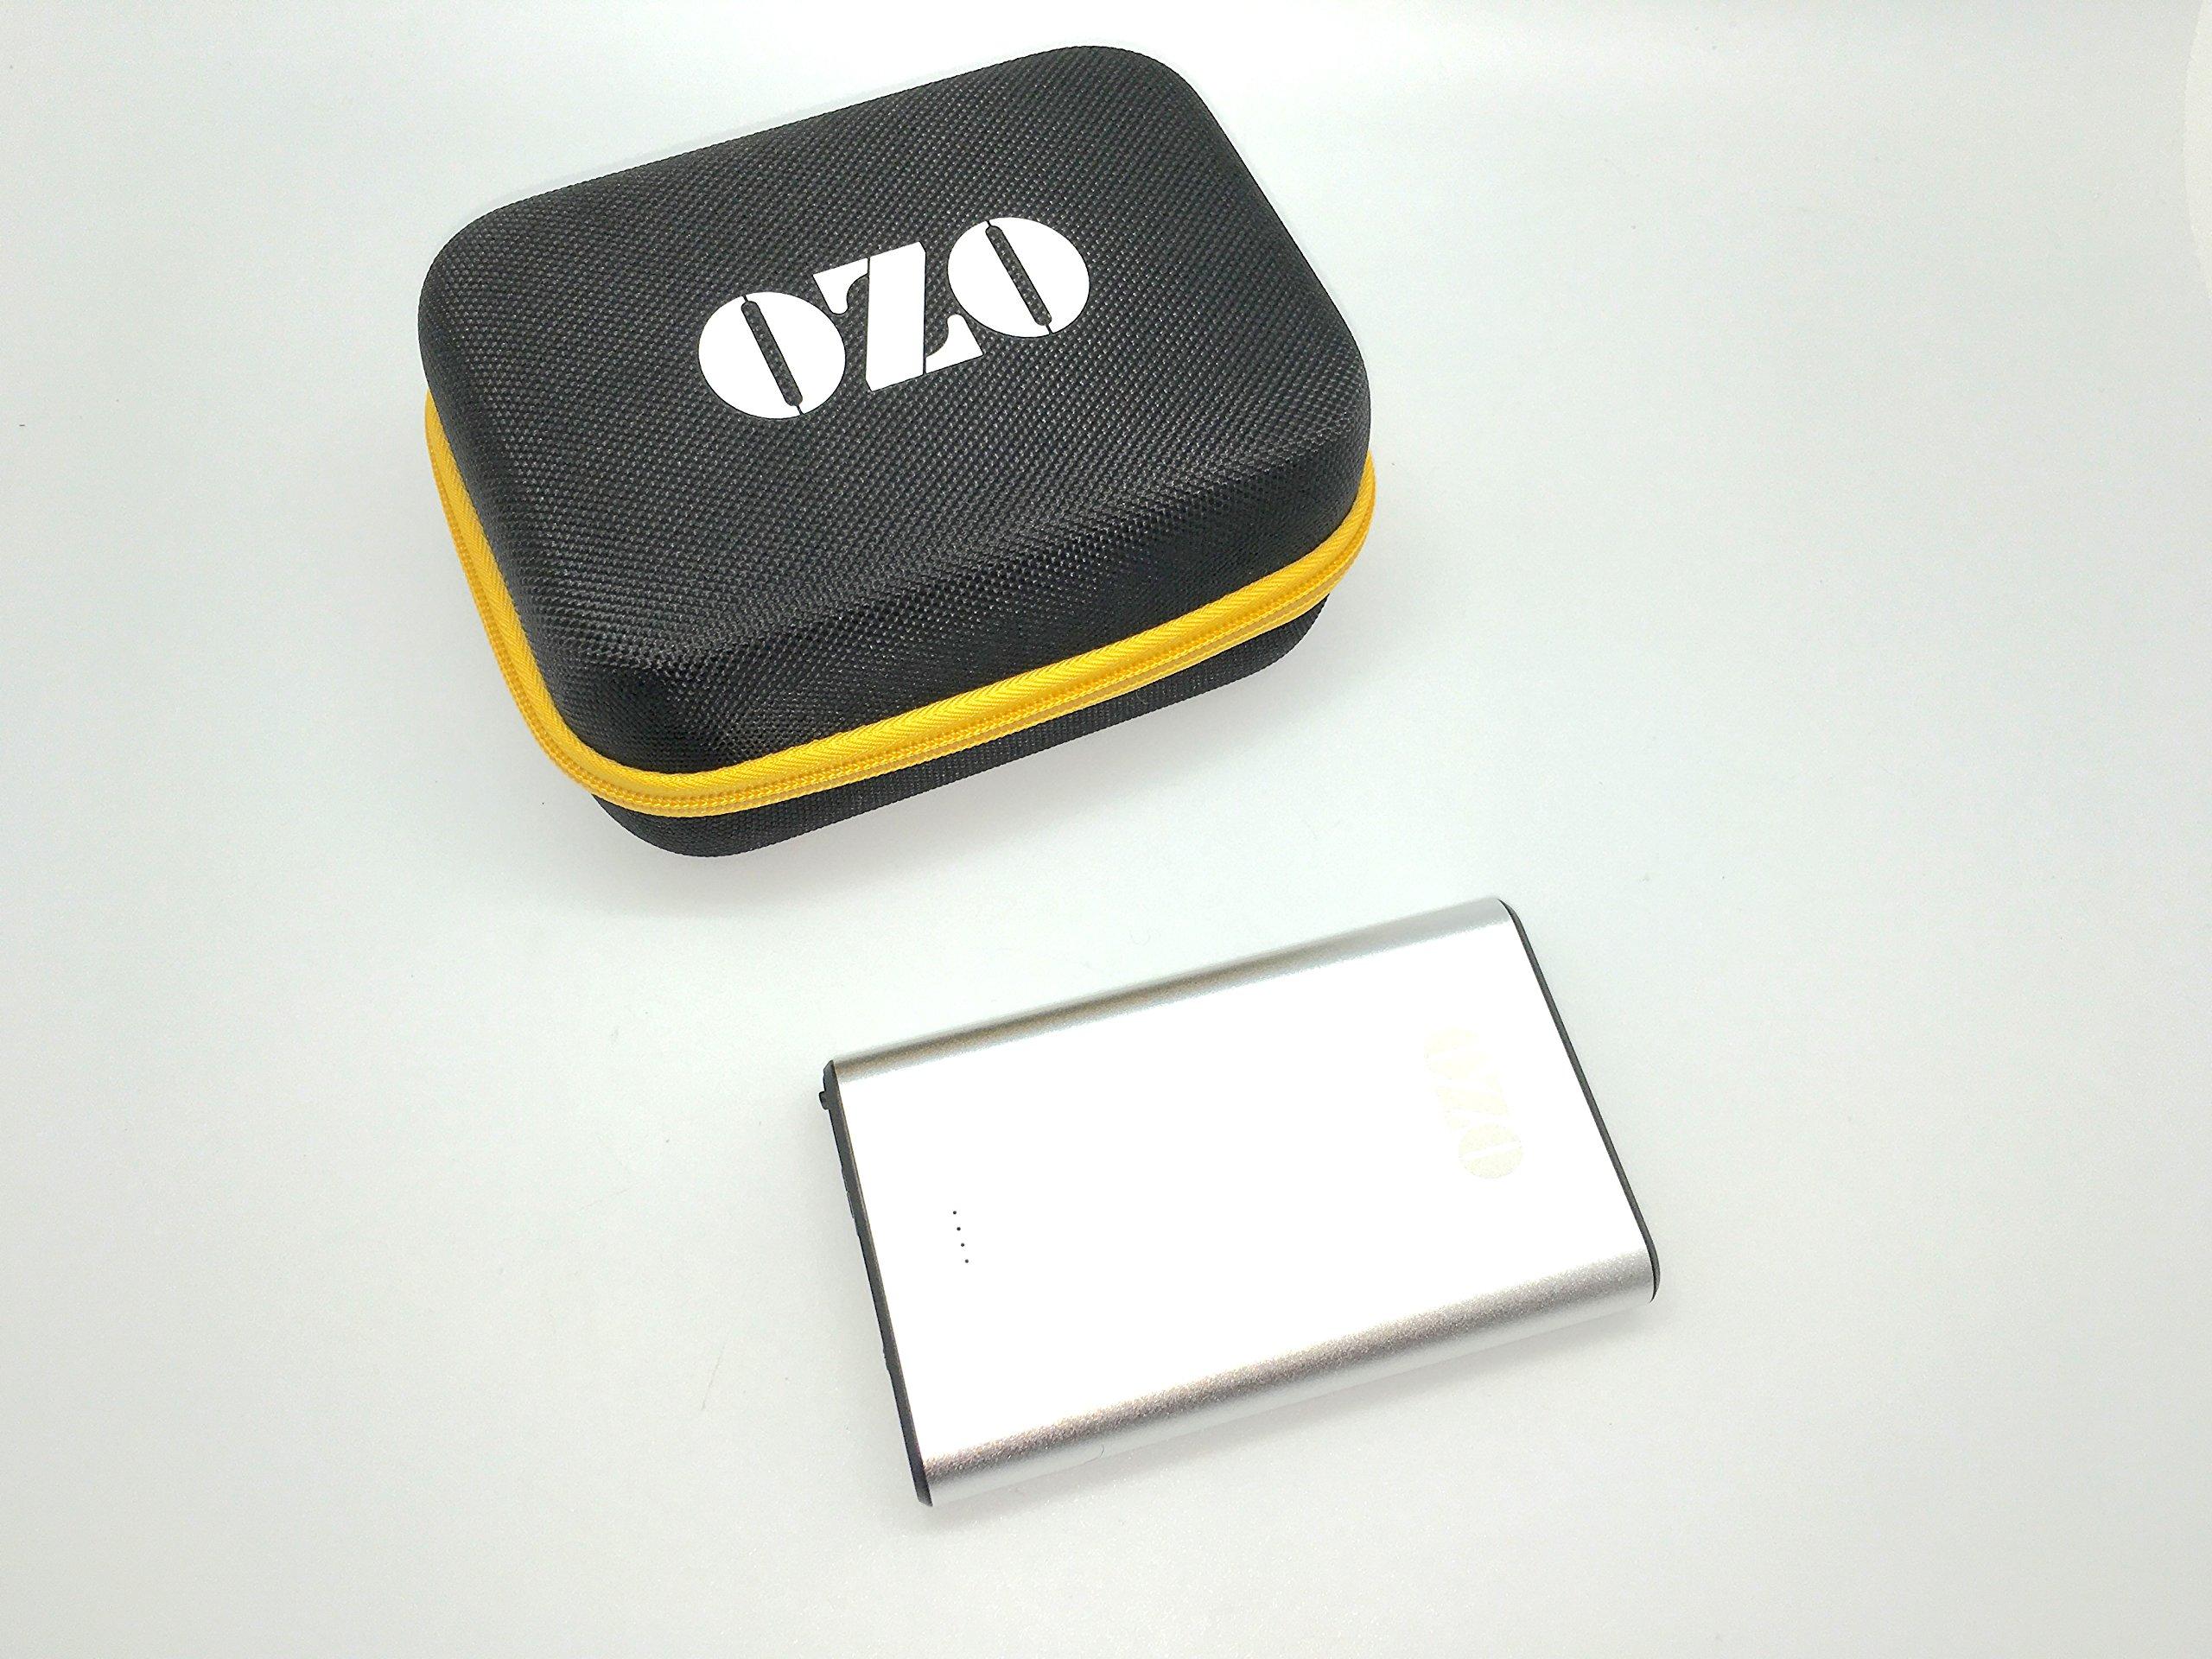 Batterie externe Powerbank Start Booster d/émarrage Lithium G10 OZO D/émarreur voiture Jump Starter